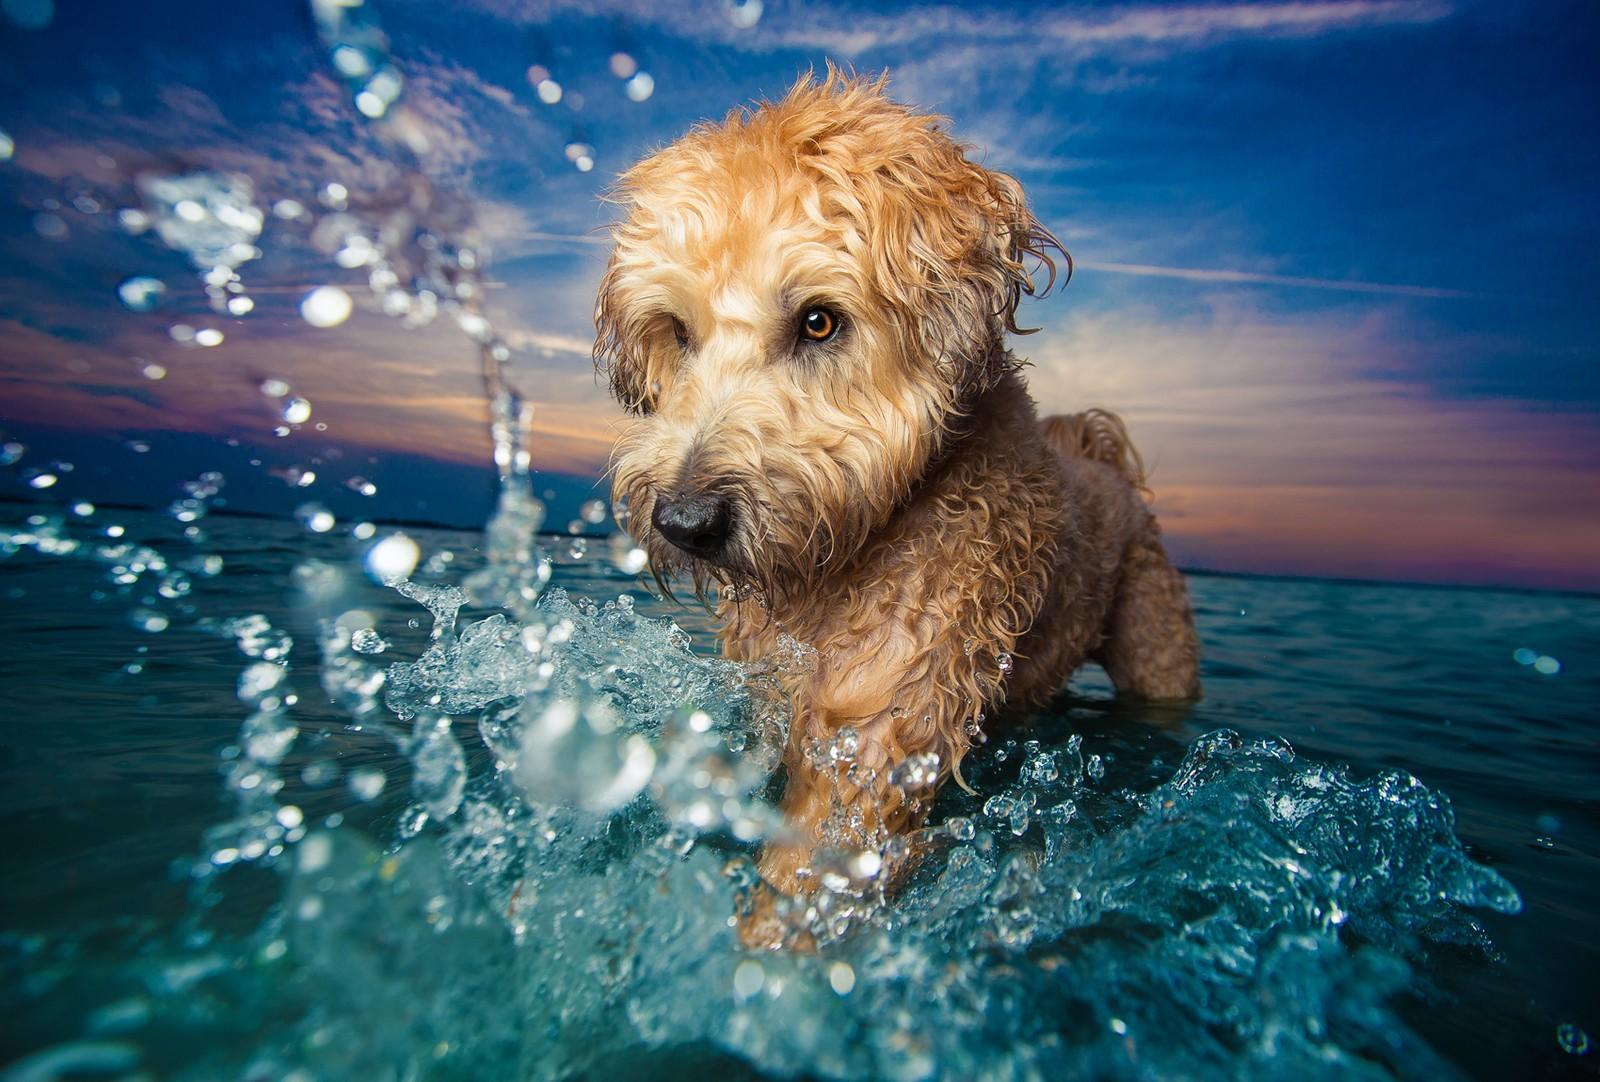 concurso anual fotografia de cães